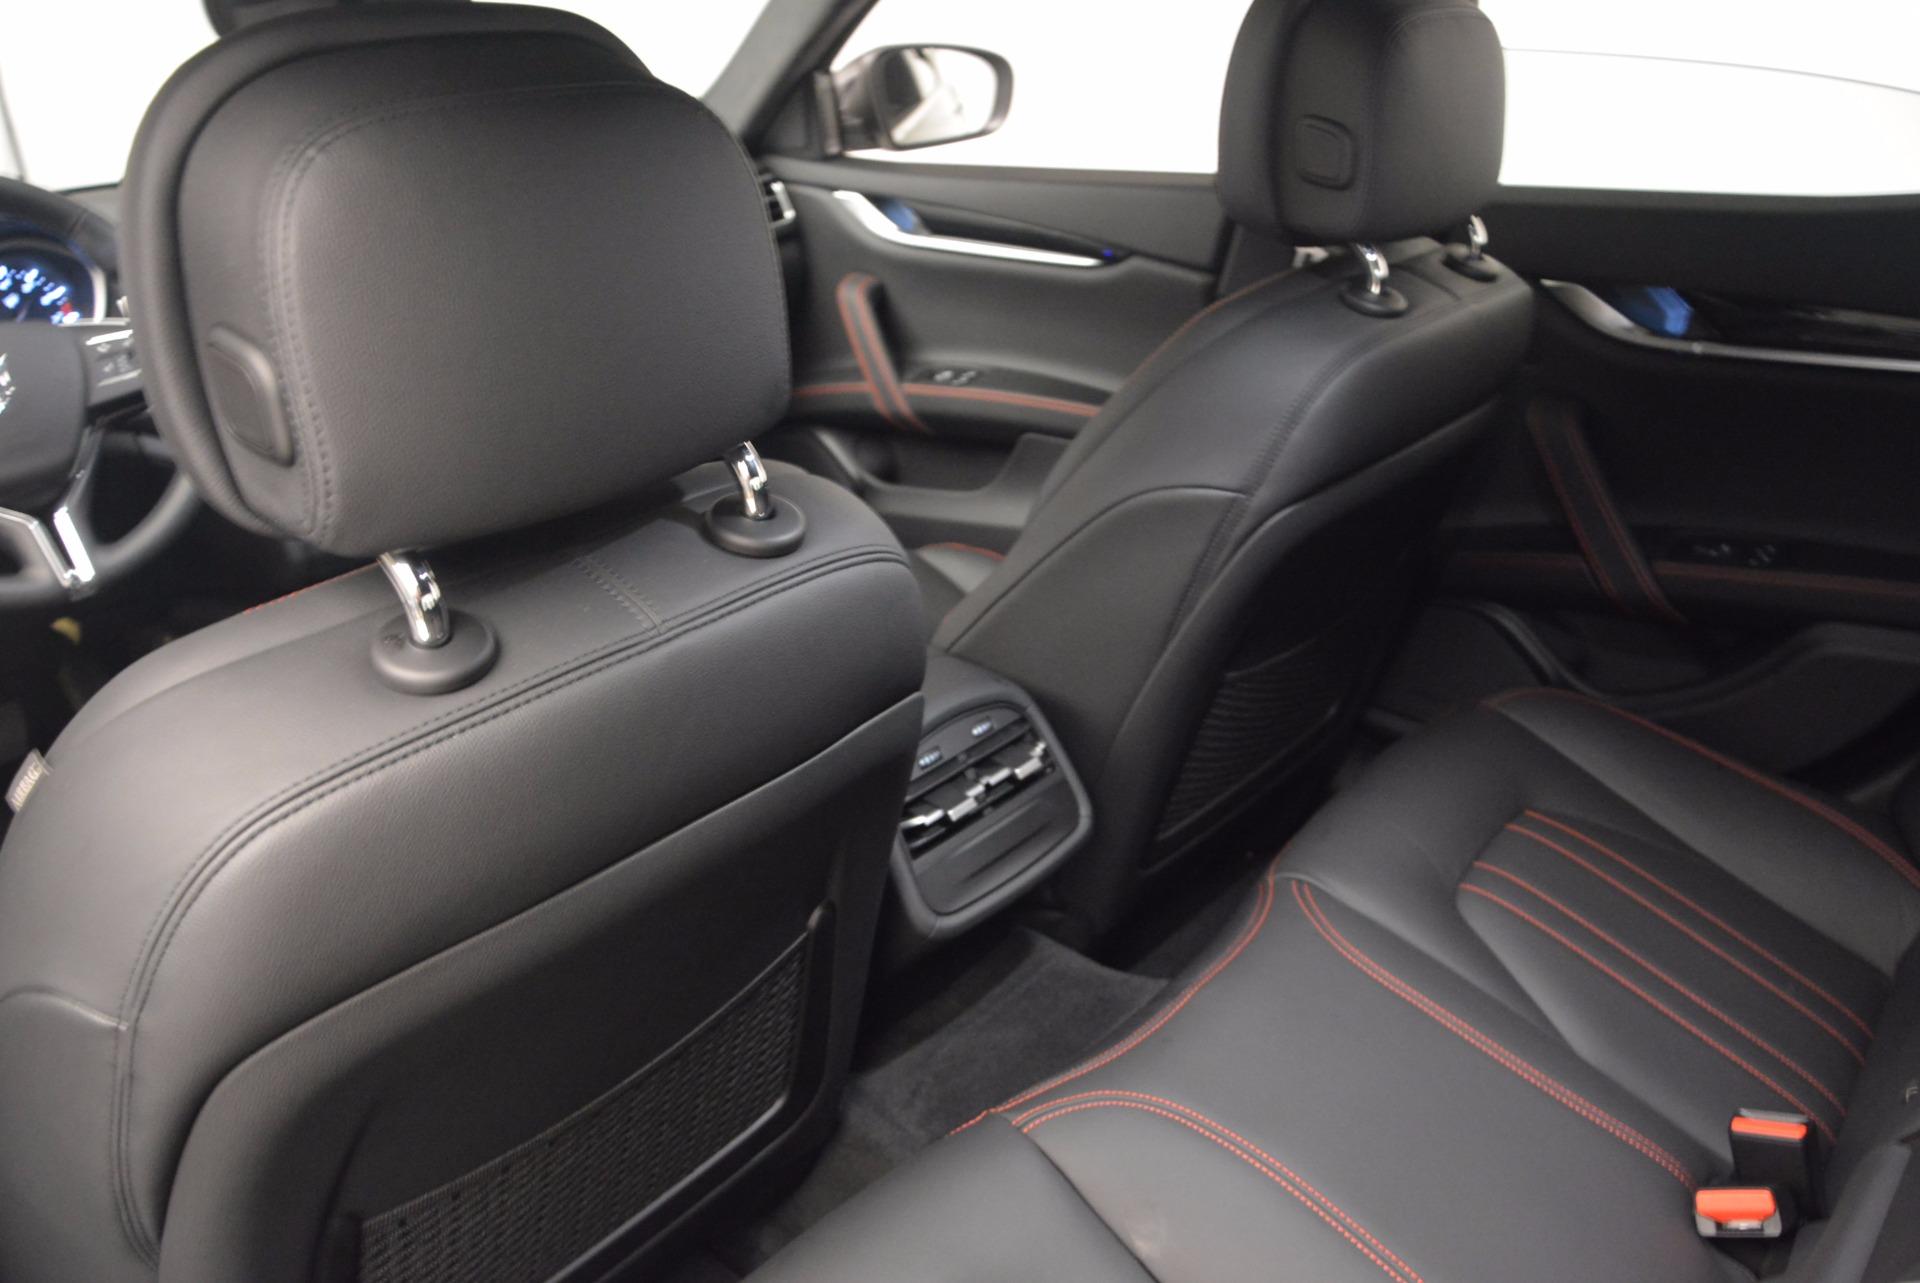 Used 2017 Maserati Ghibli S Q4 Ex-Loaner For Sale In Westport, CT 783_p18